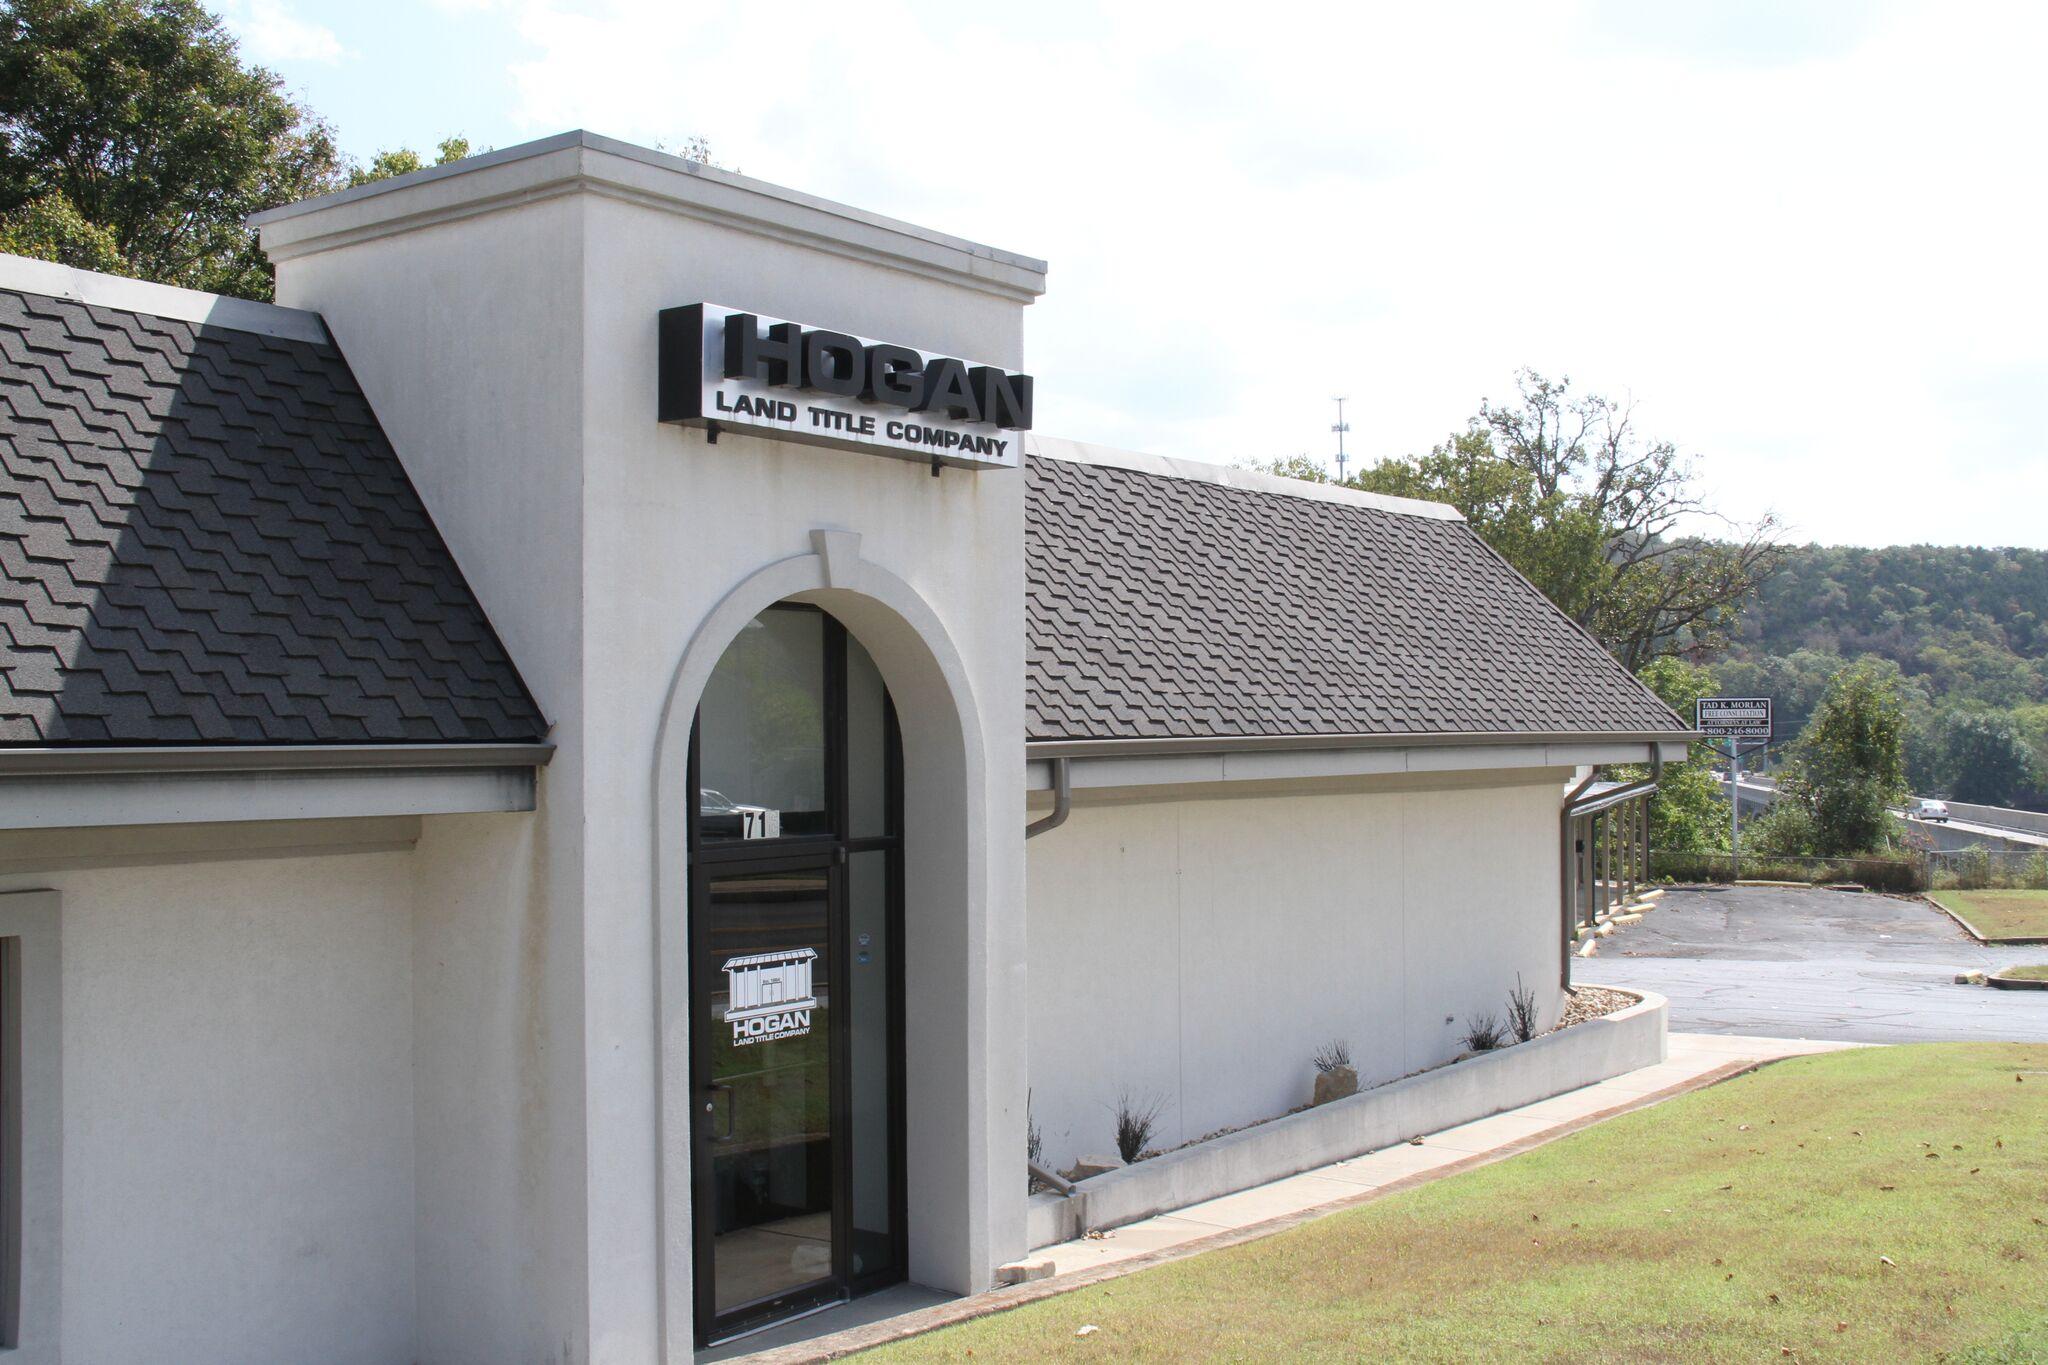 Hogan Land Title Historic Downtown Branson